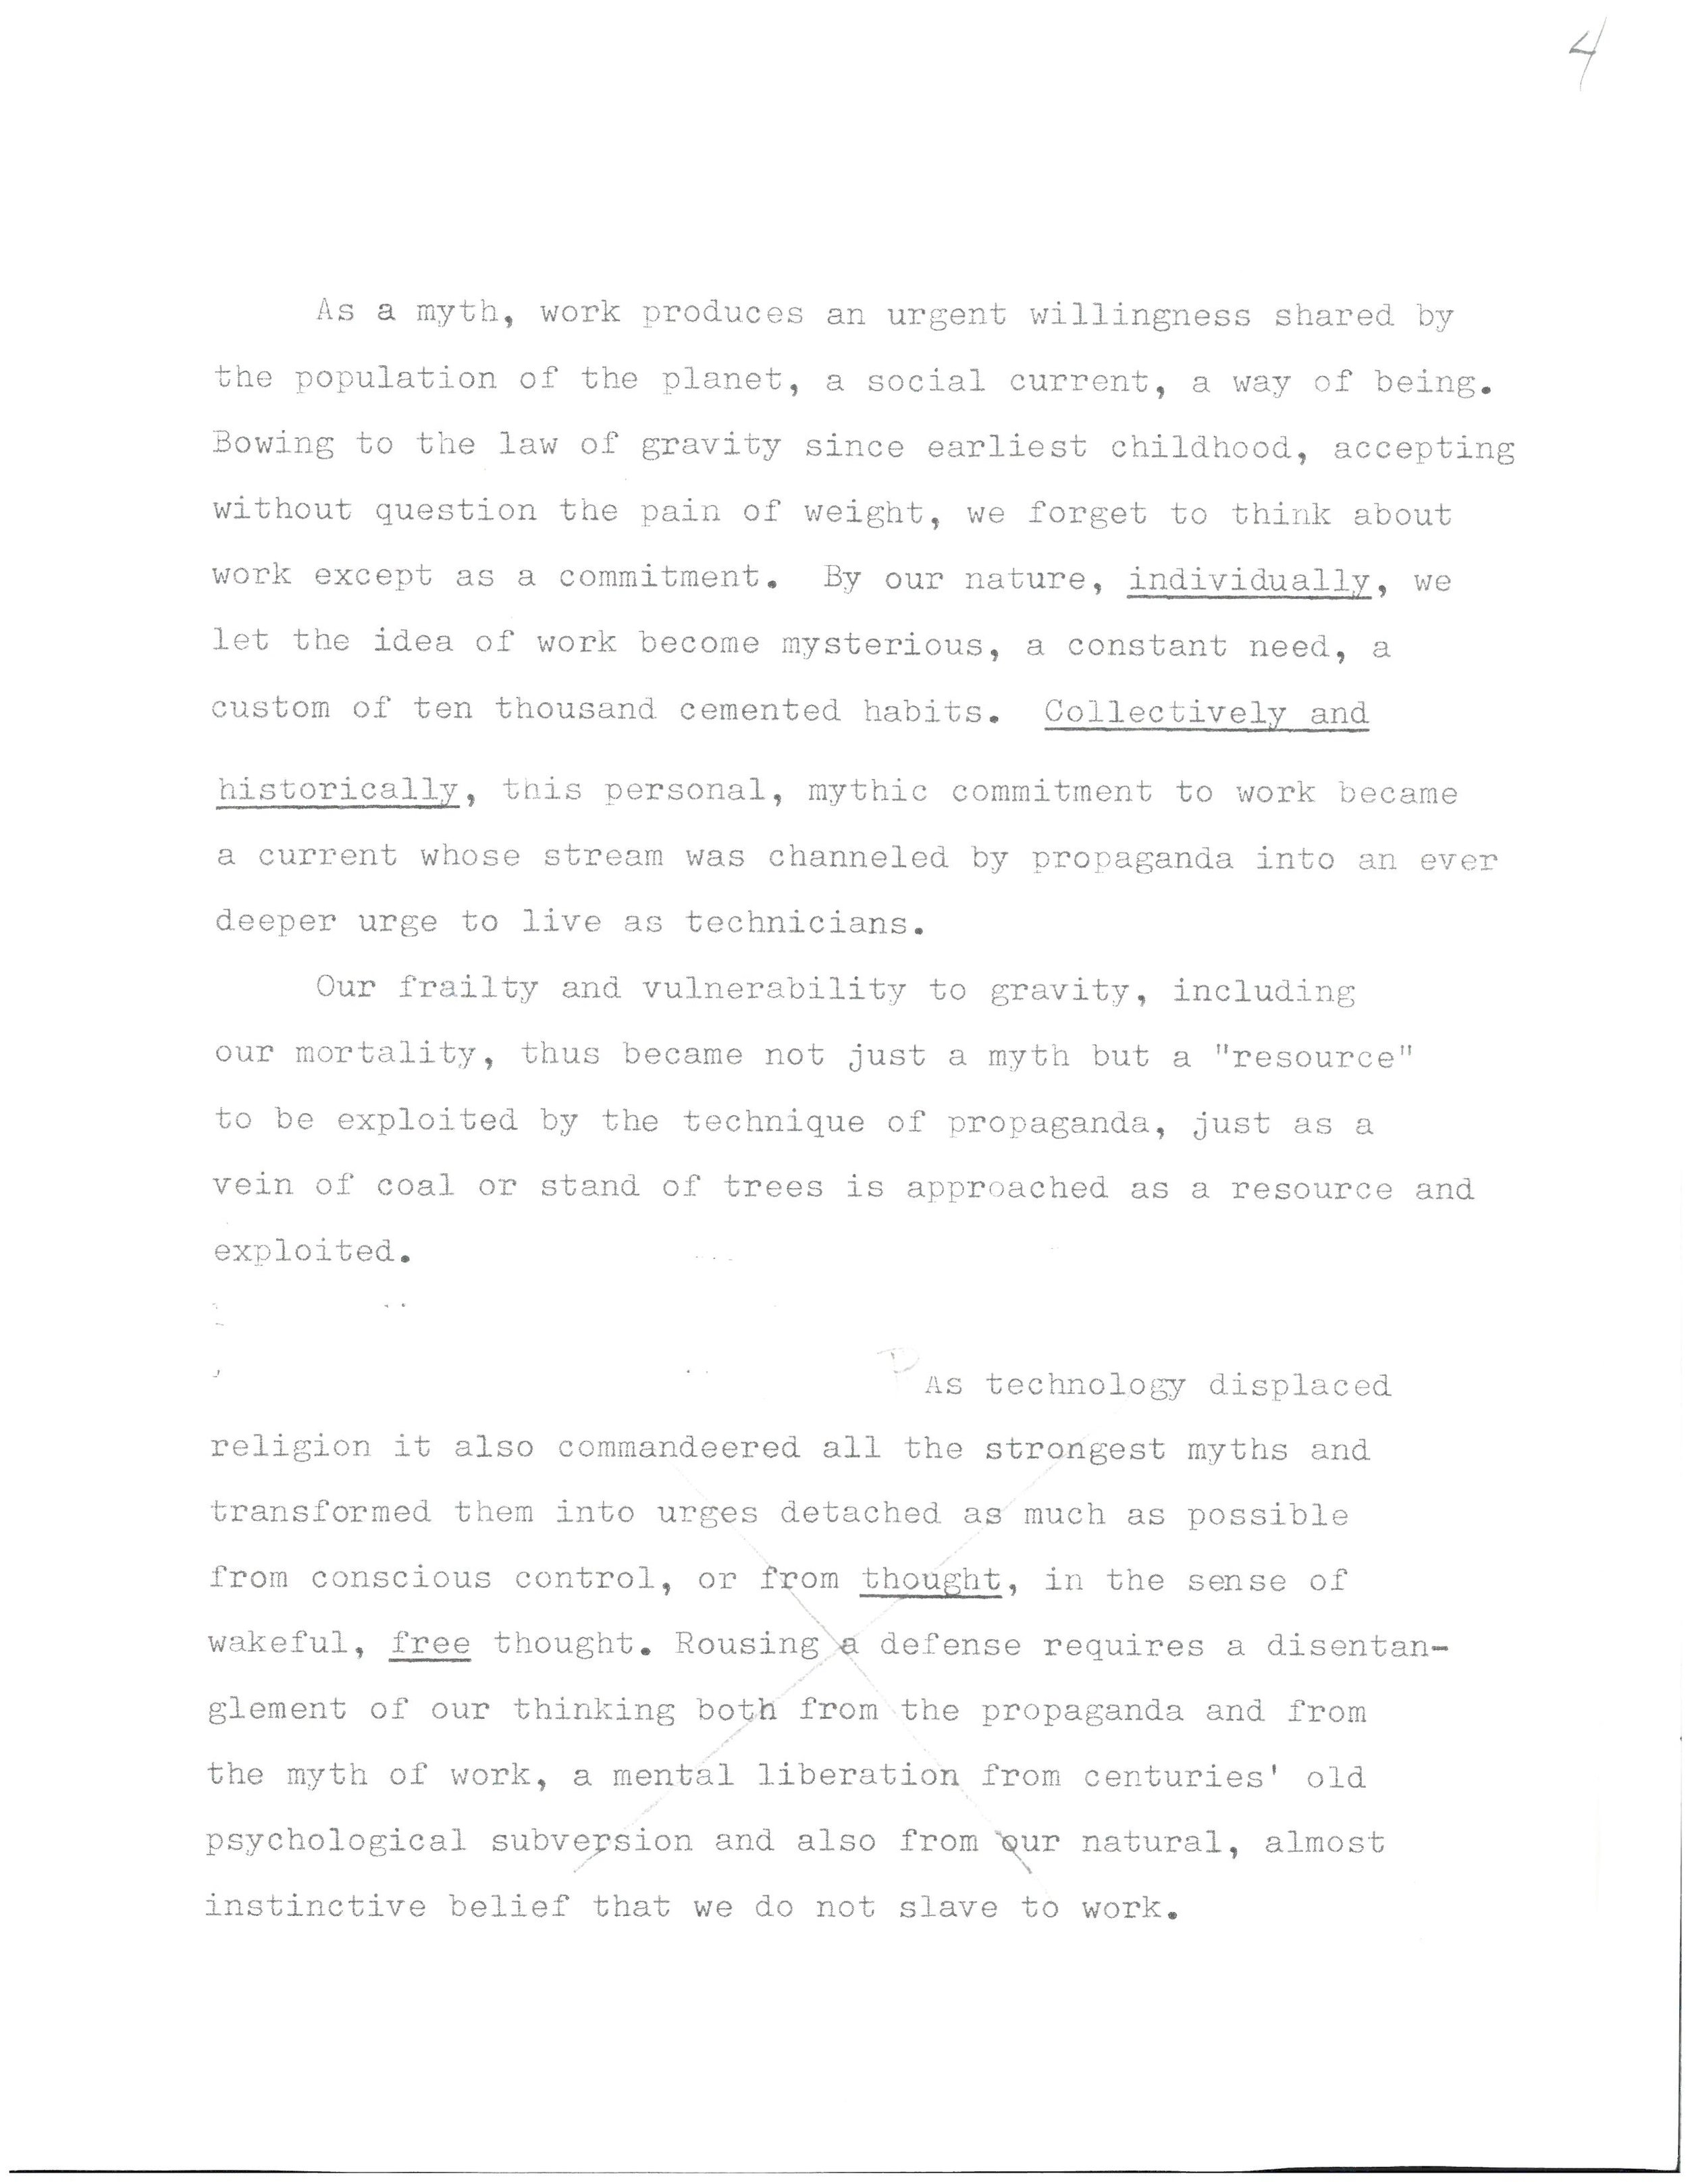 Propaganda_Page_06.jpg